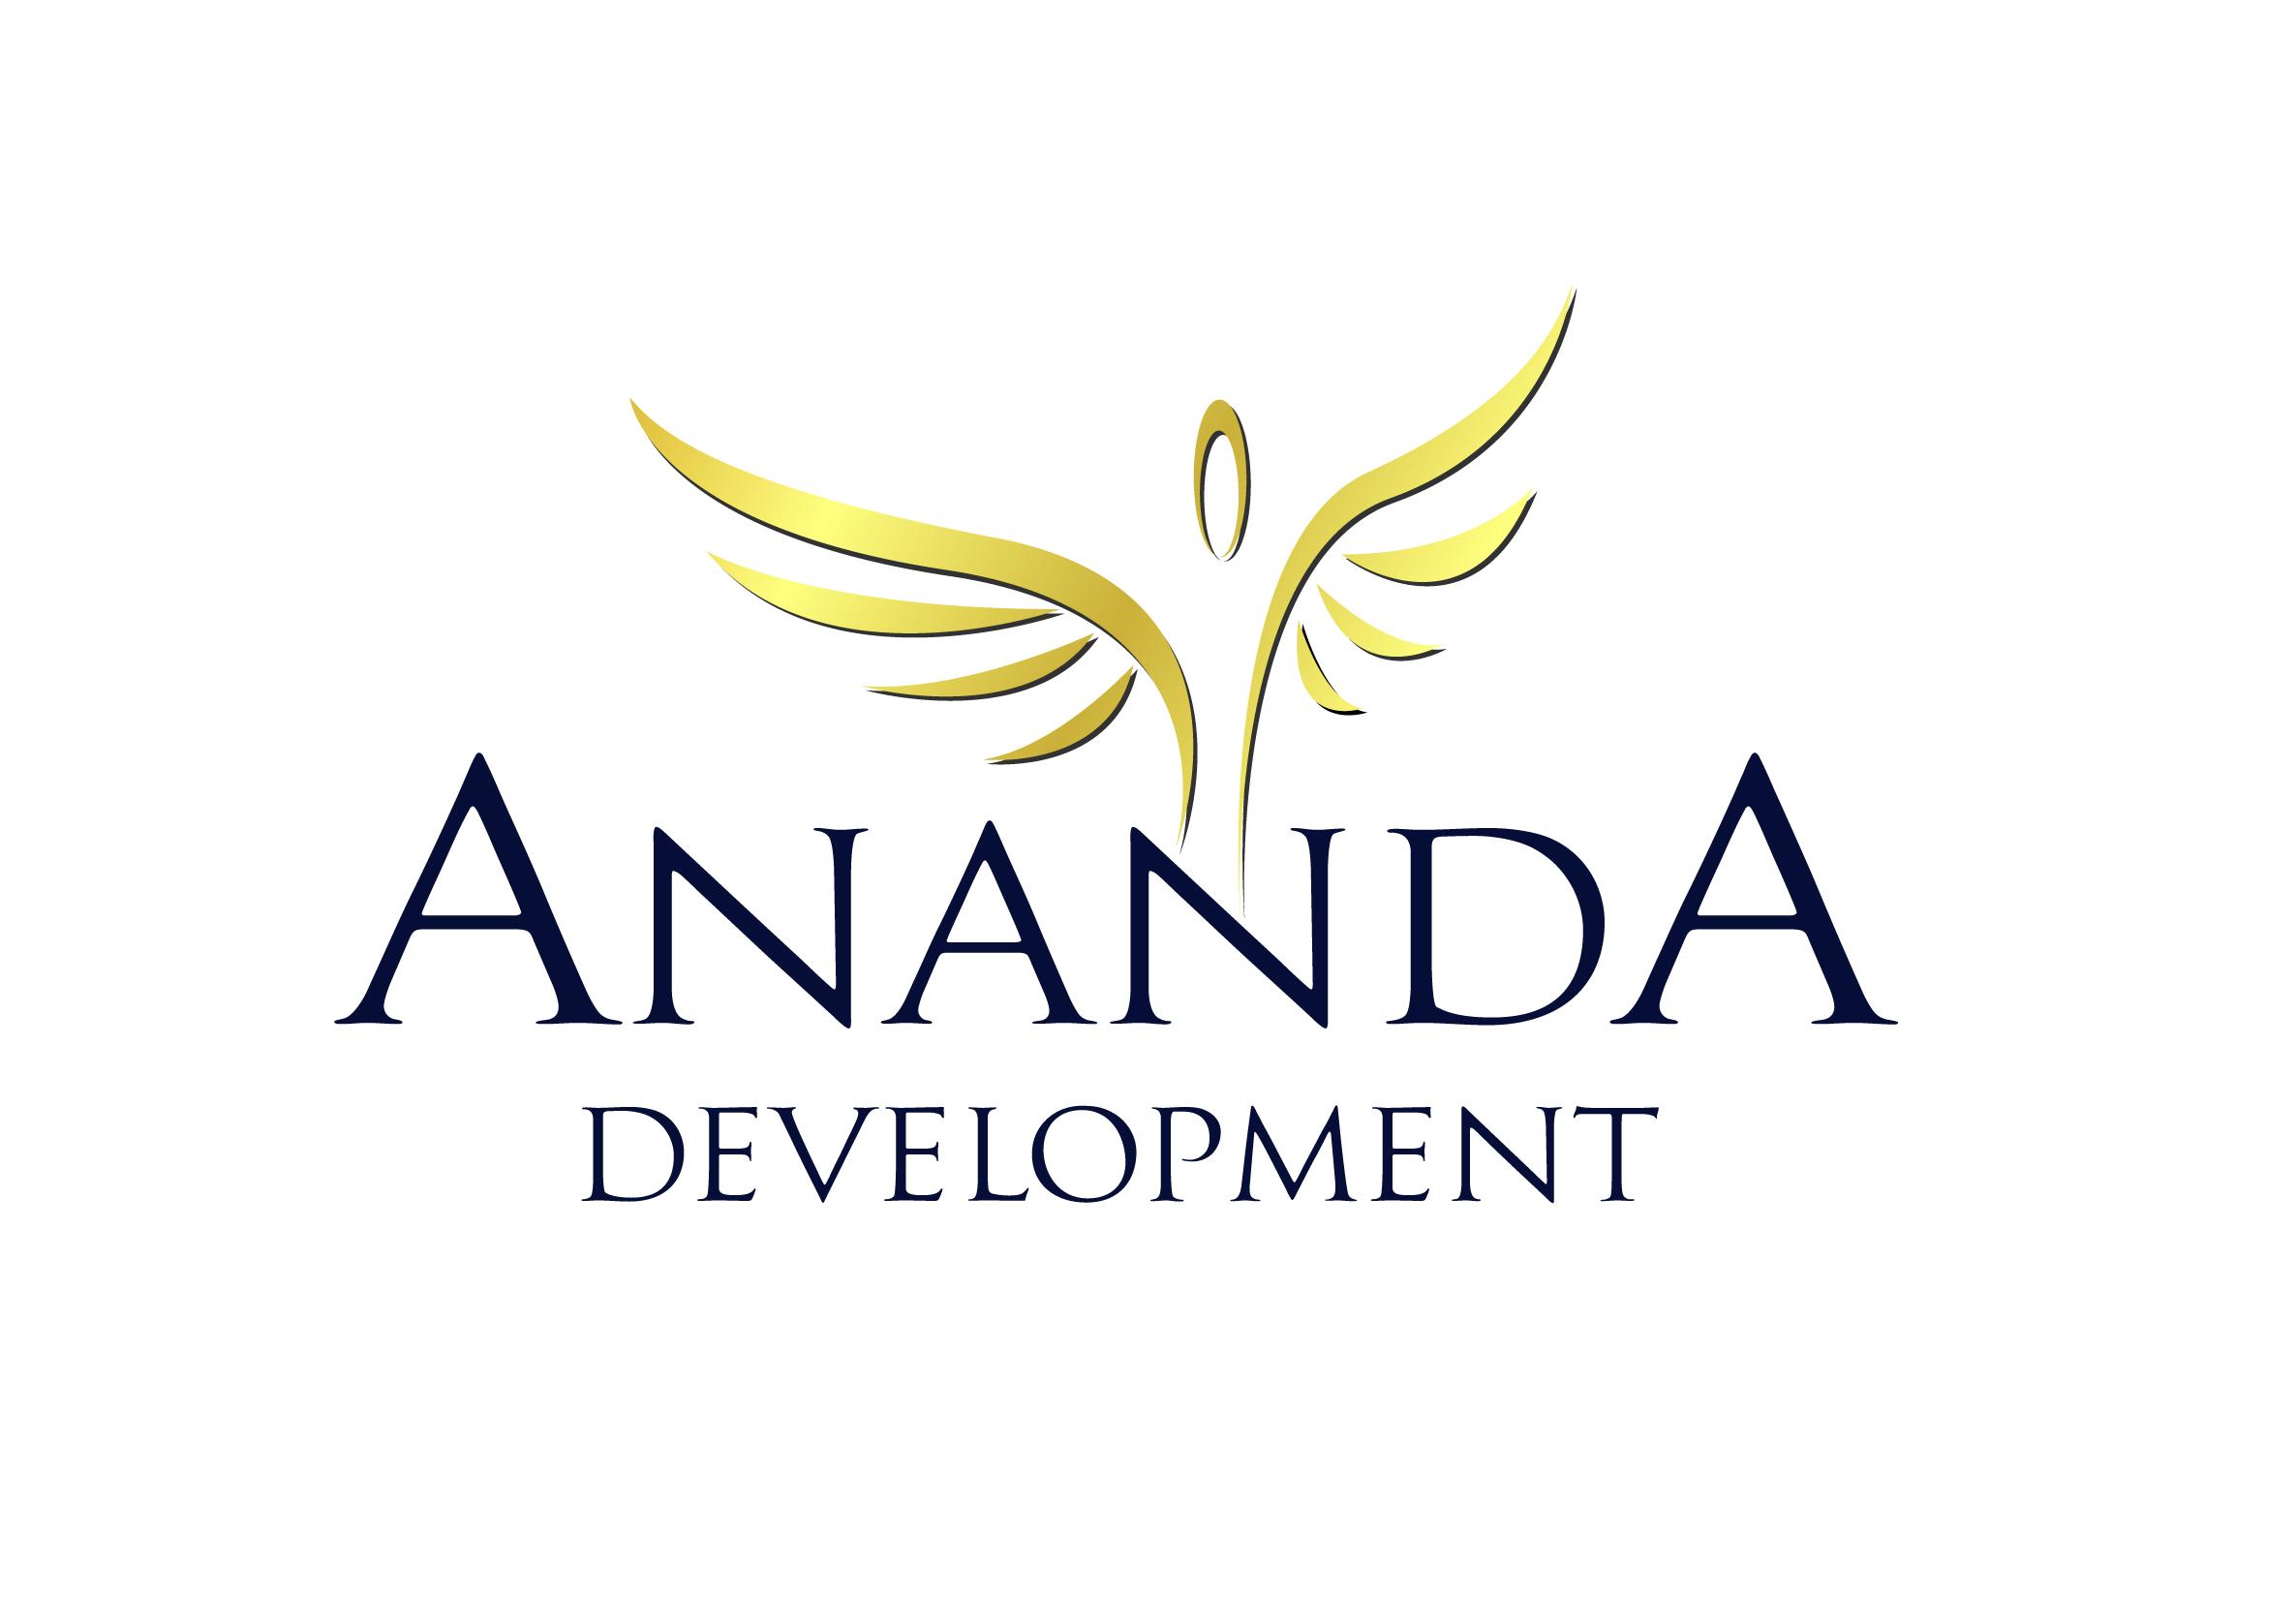 17 in 17 for Ananda Development.